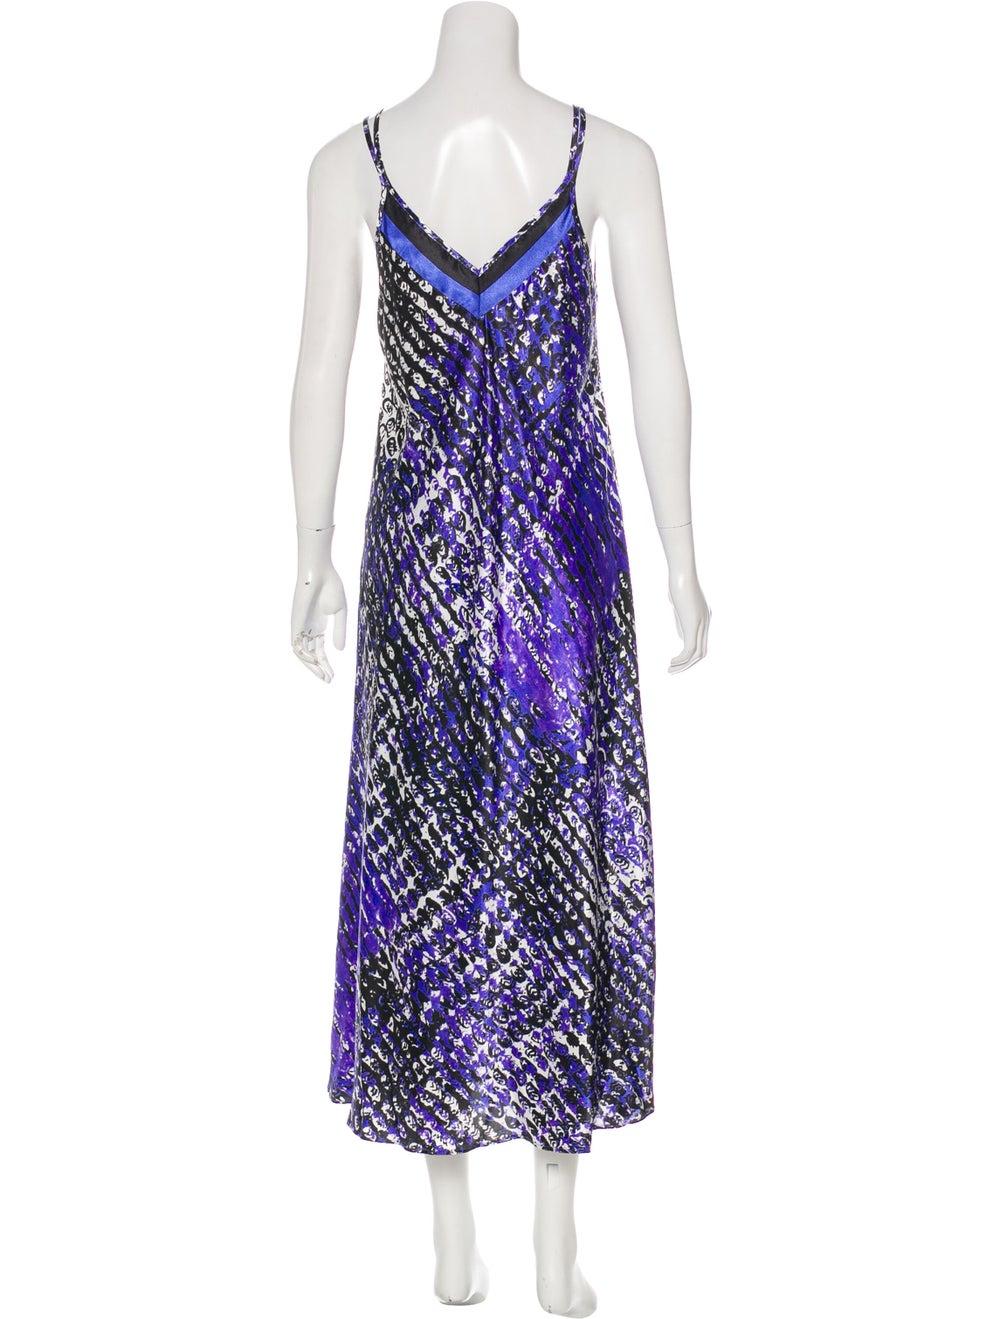 Oscar de la Renta Sleeveless Maxi Dress Purple - image 3